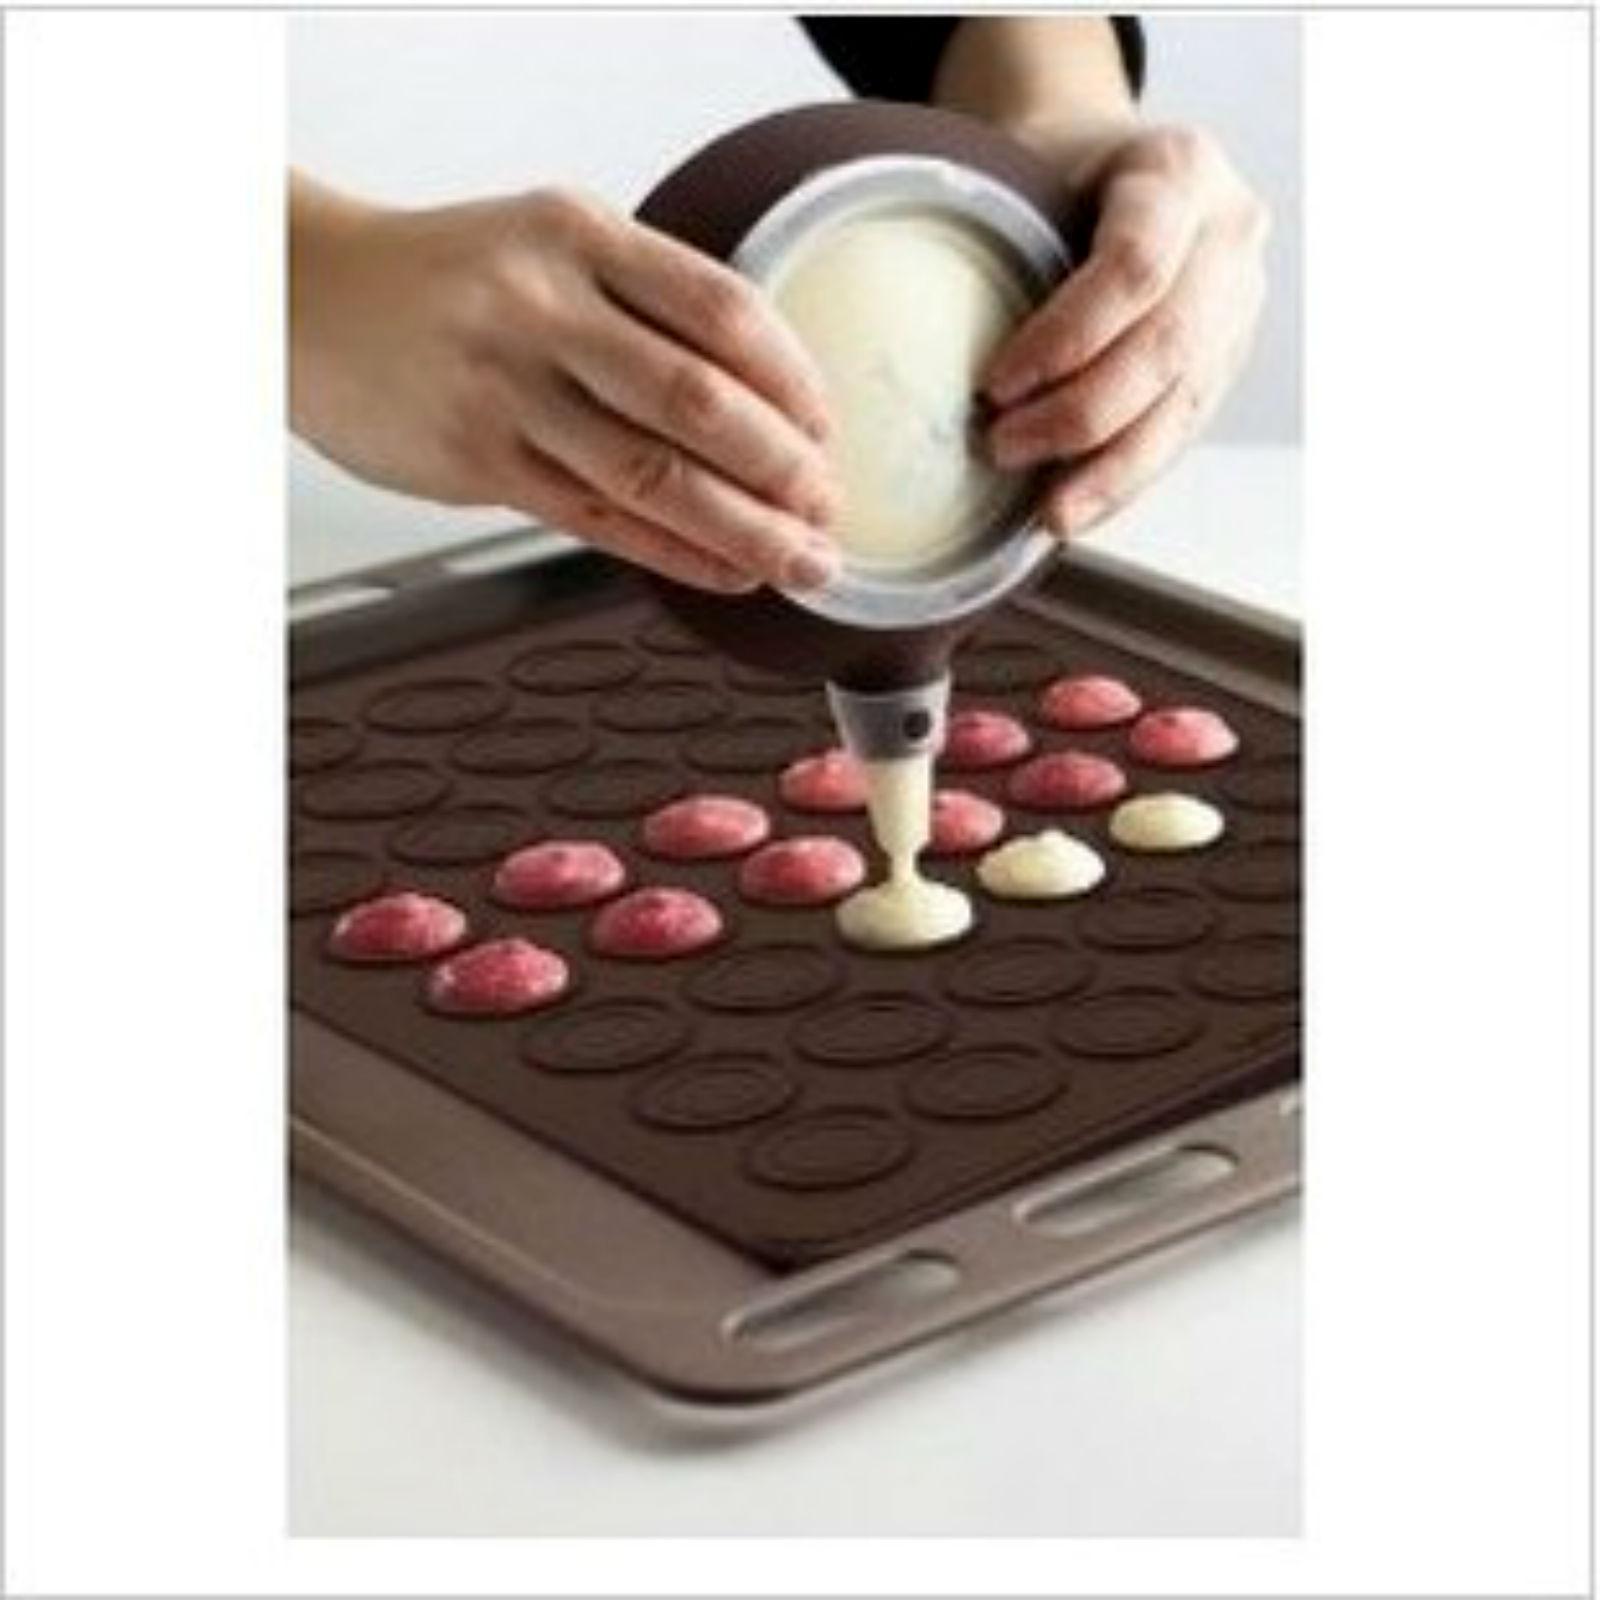 Image of 39.5x30cm Macaroon Silicone Baking Mat Decoration Pen Set Bakery Use Utensil